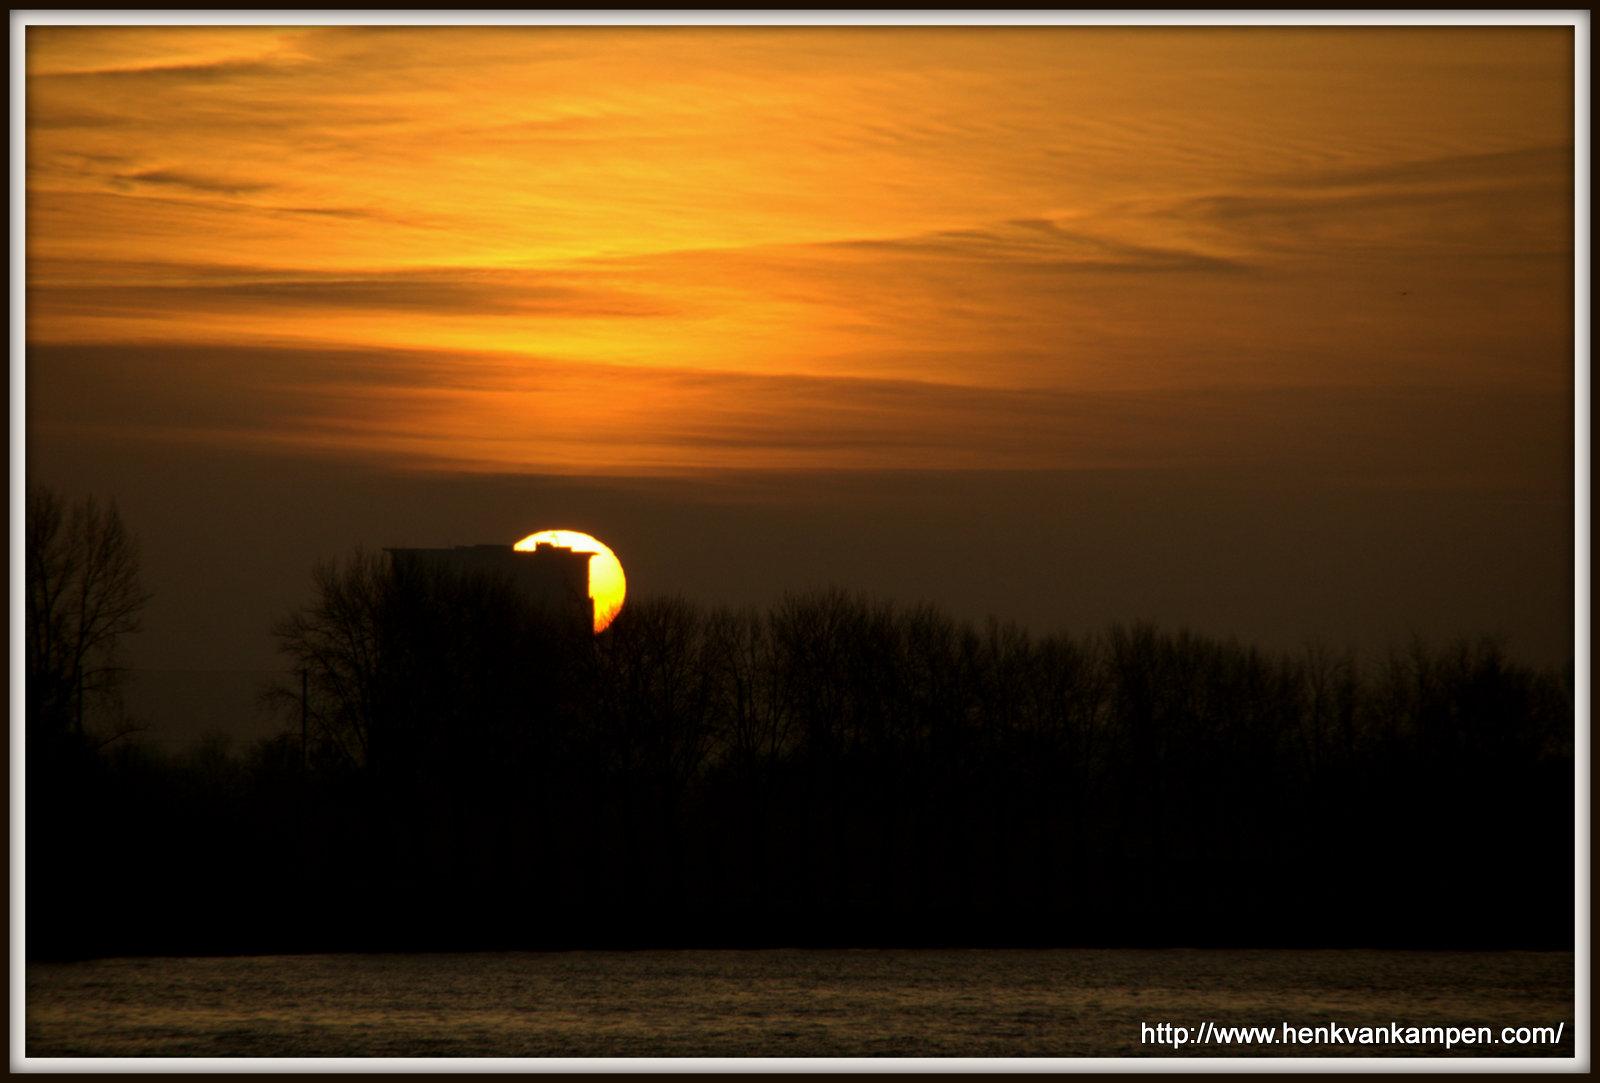 Sunrise on the Amsterdam Rhine Canal, Nieuwegein, the Netherlands